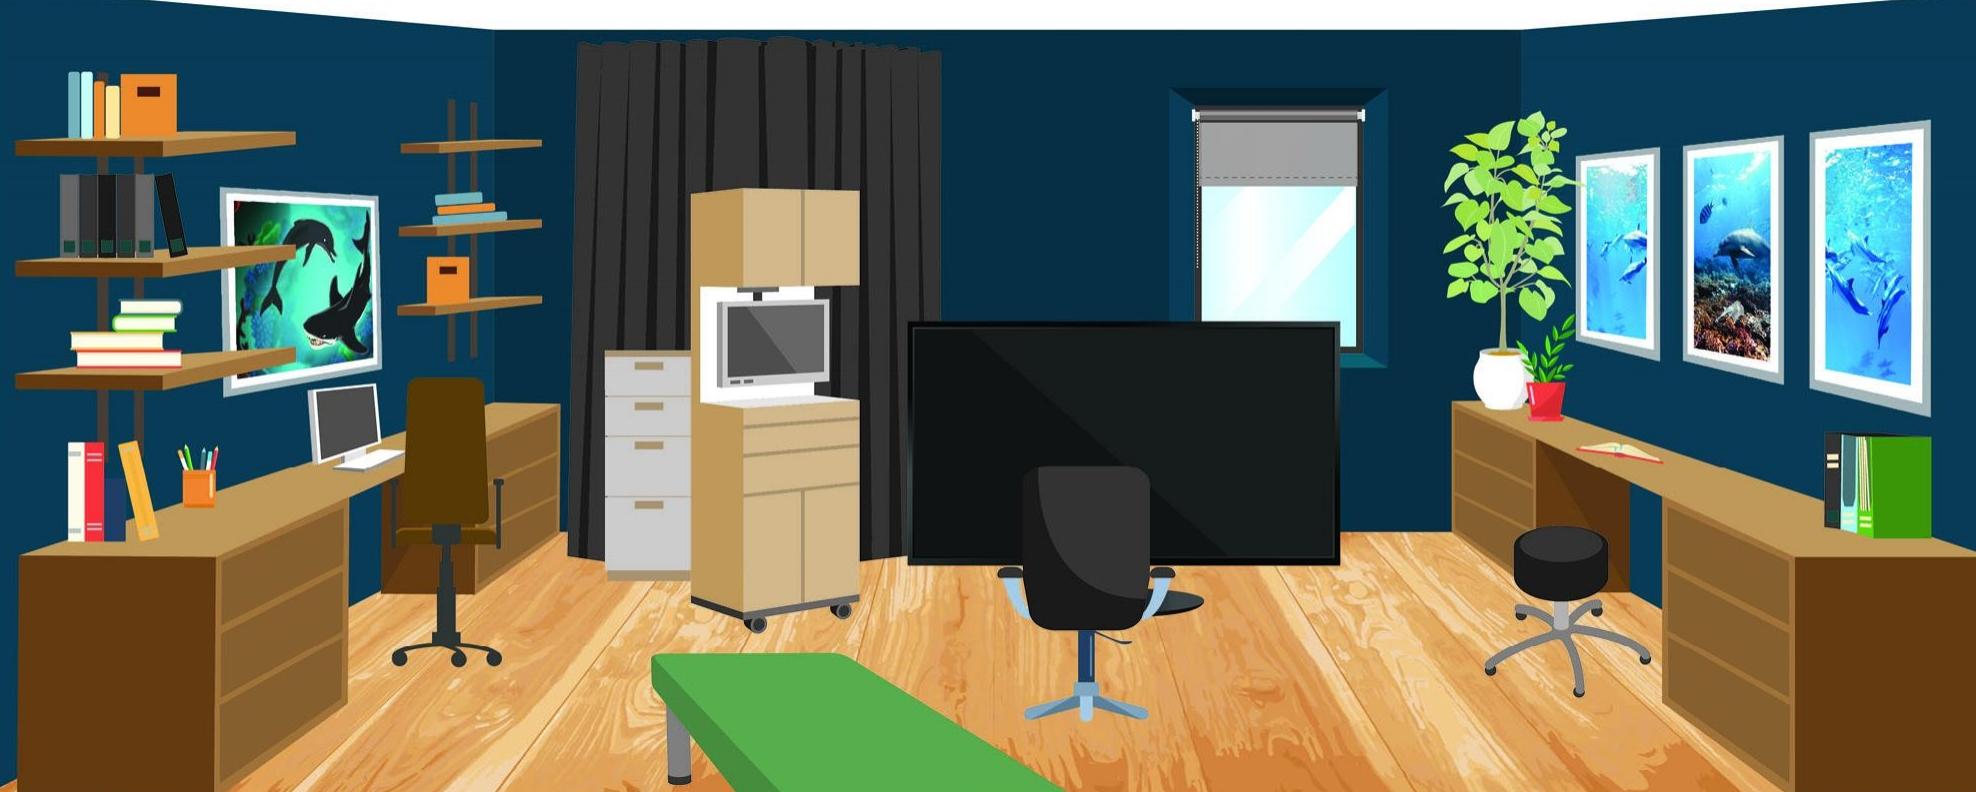 Blam Patient Room Suggestions.jpg